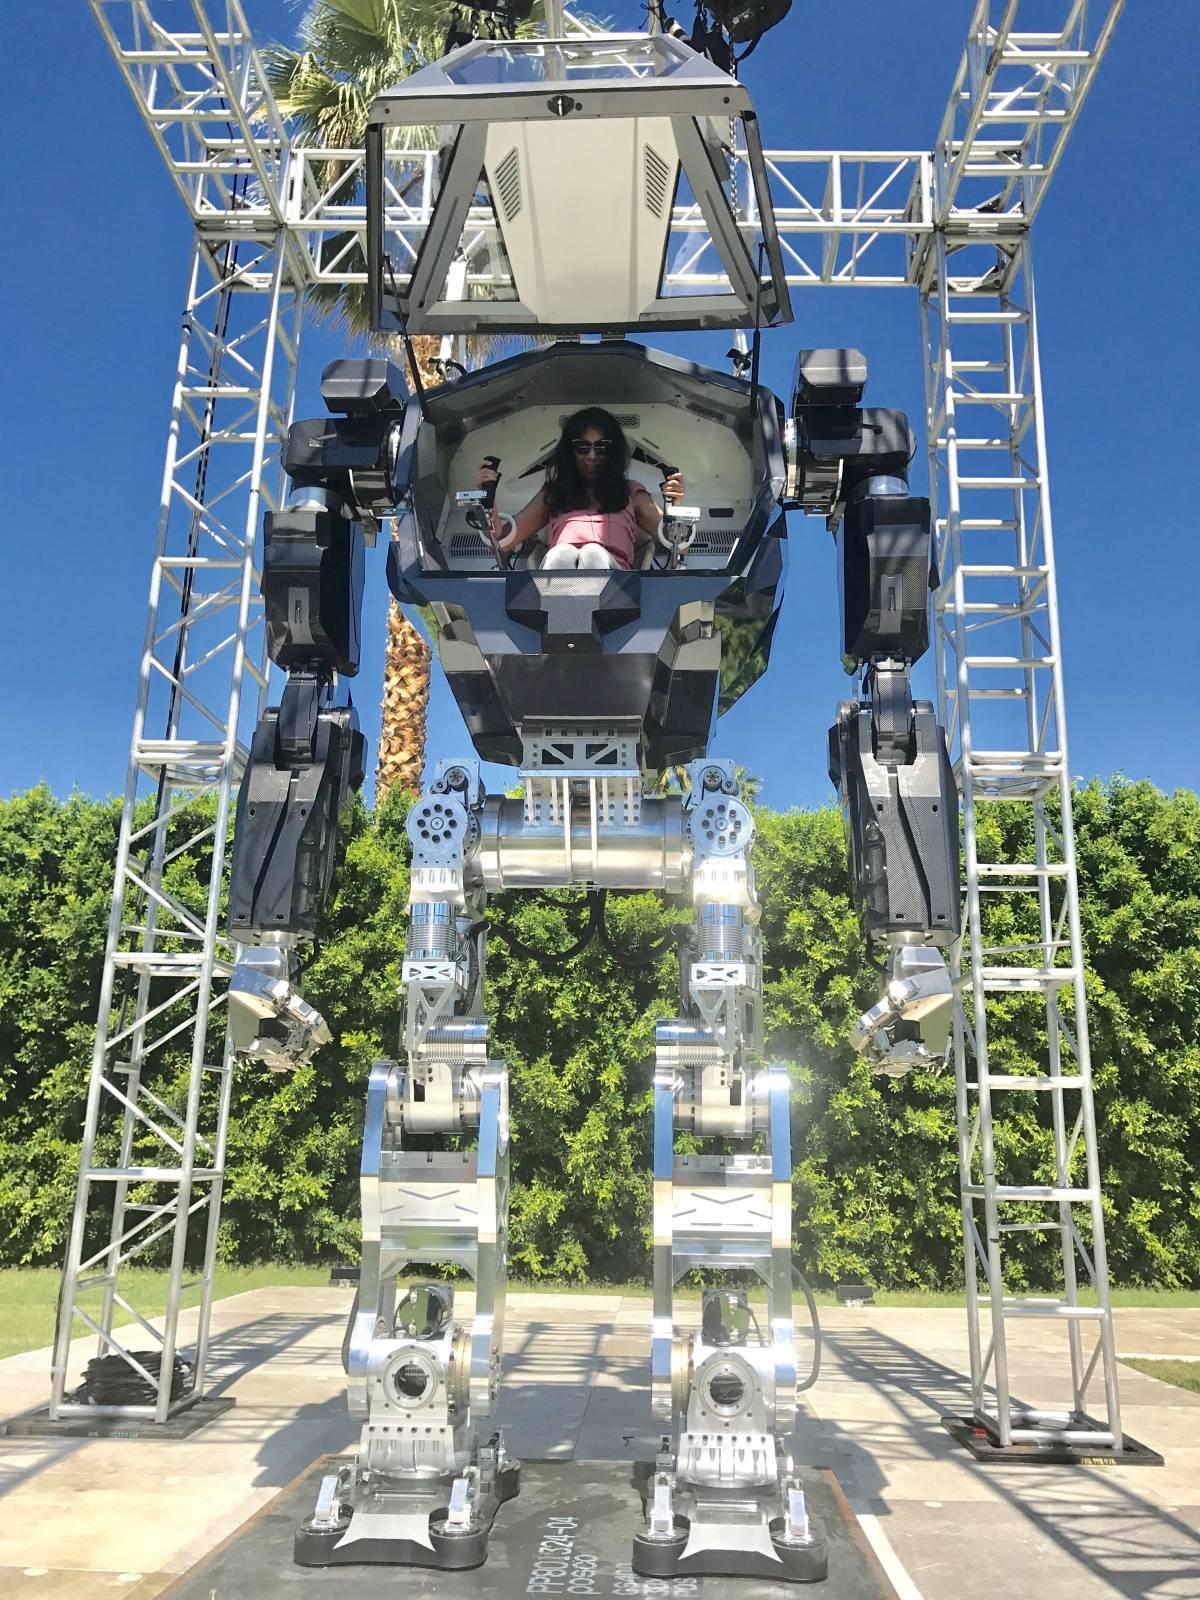 Tensorial-Professor Anima on AI | Arfiticial intelligence, Machine